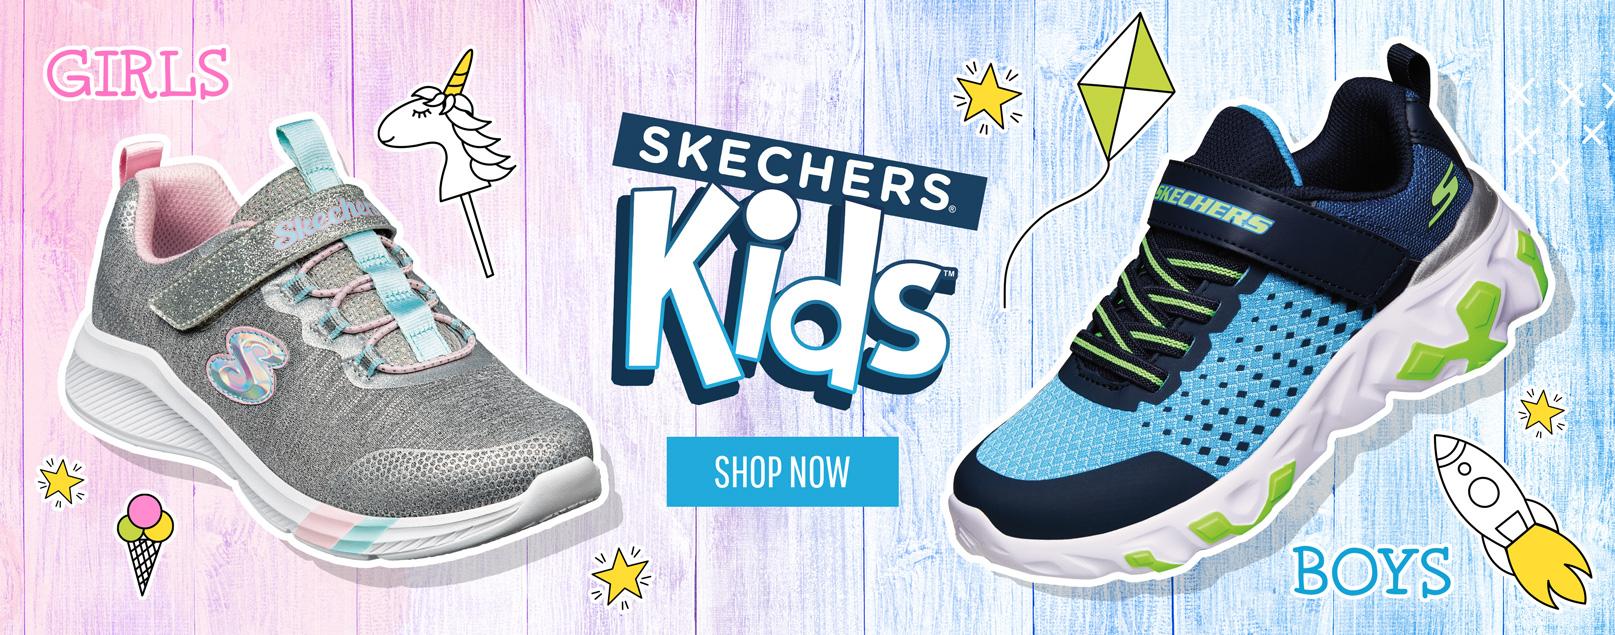 where to buy skechers for kids